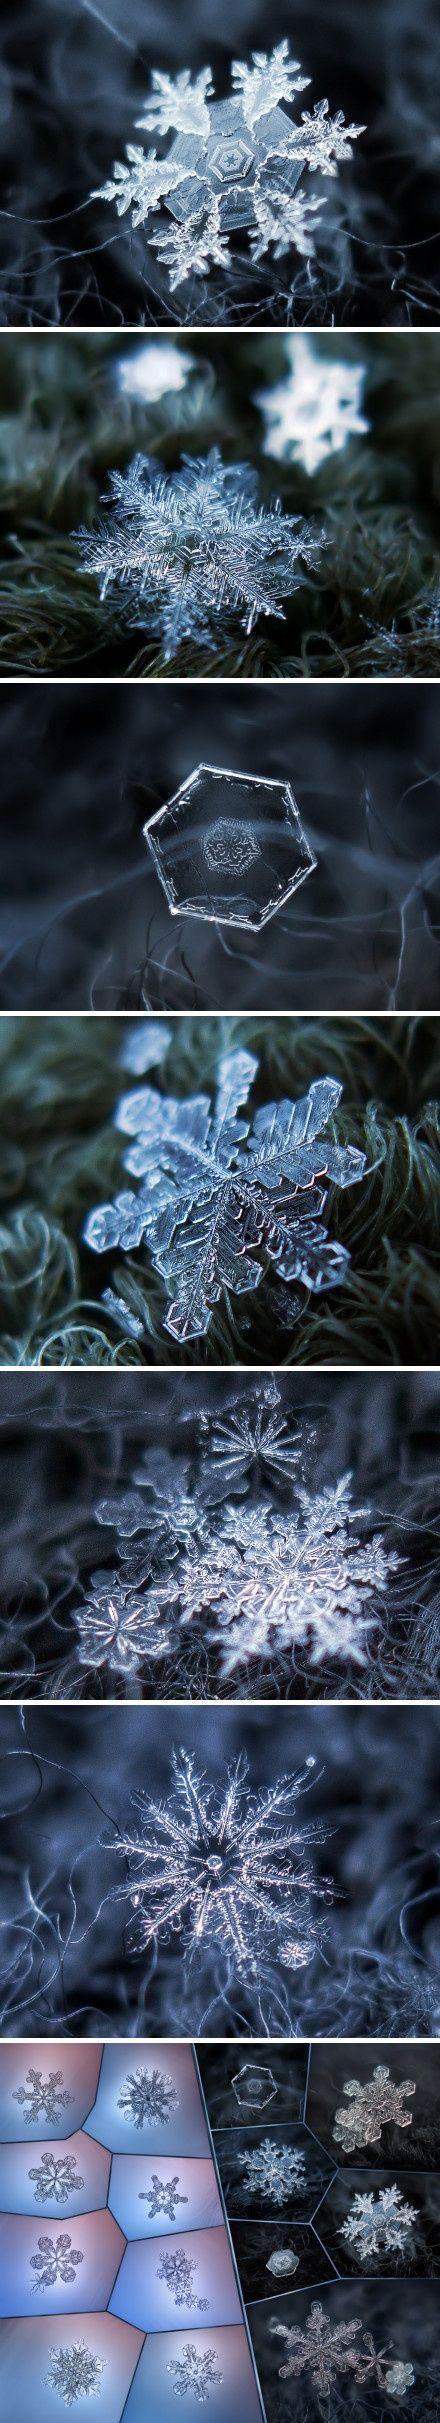 76 best snowflake images on pinterest real snowflakes snowflake